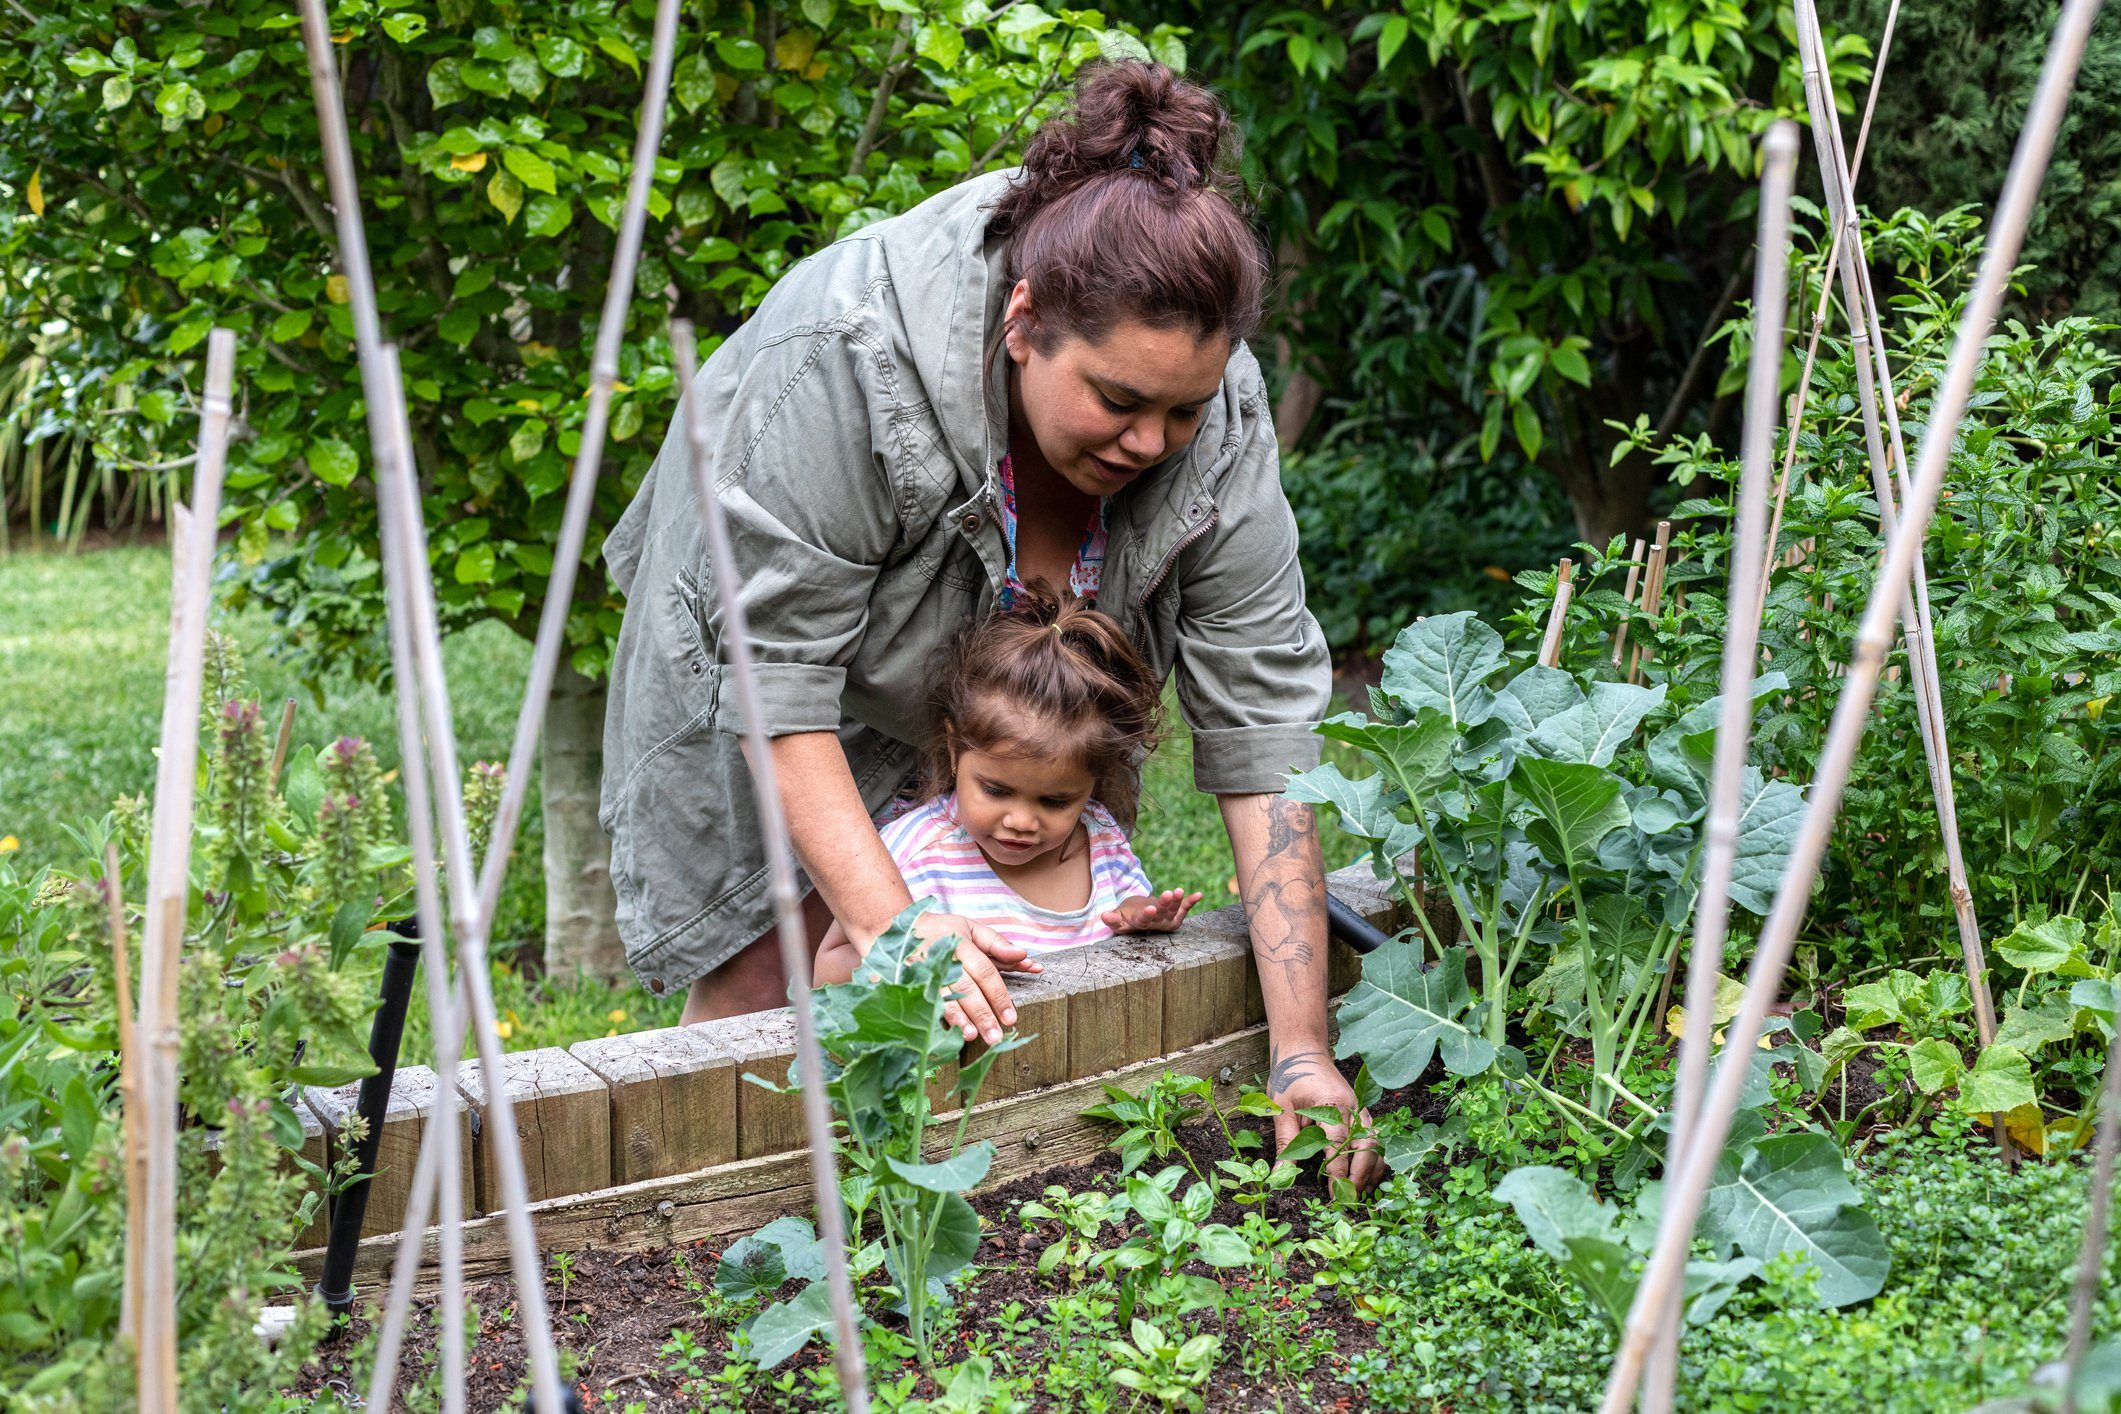 Indigenous women helping her young daughter in the garden